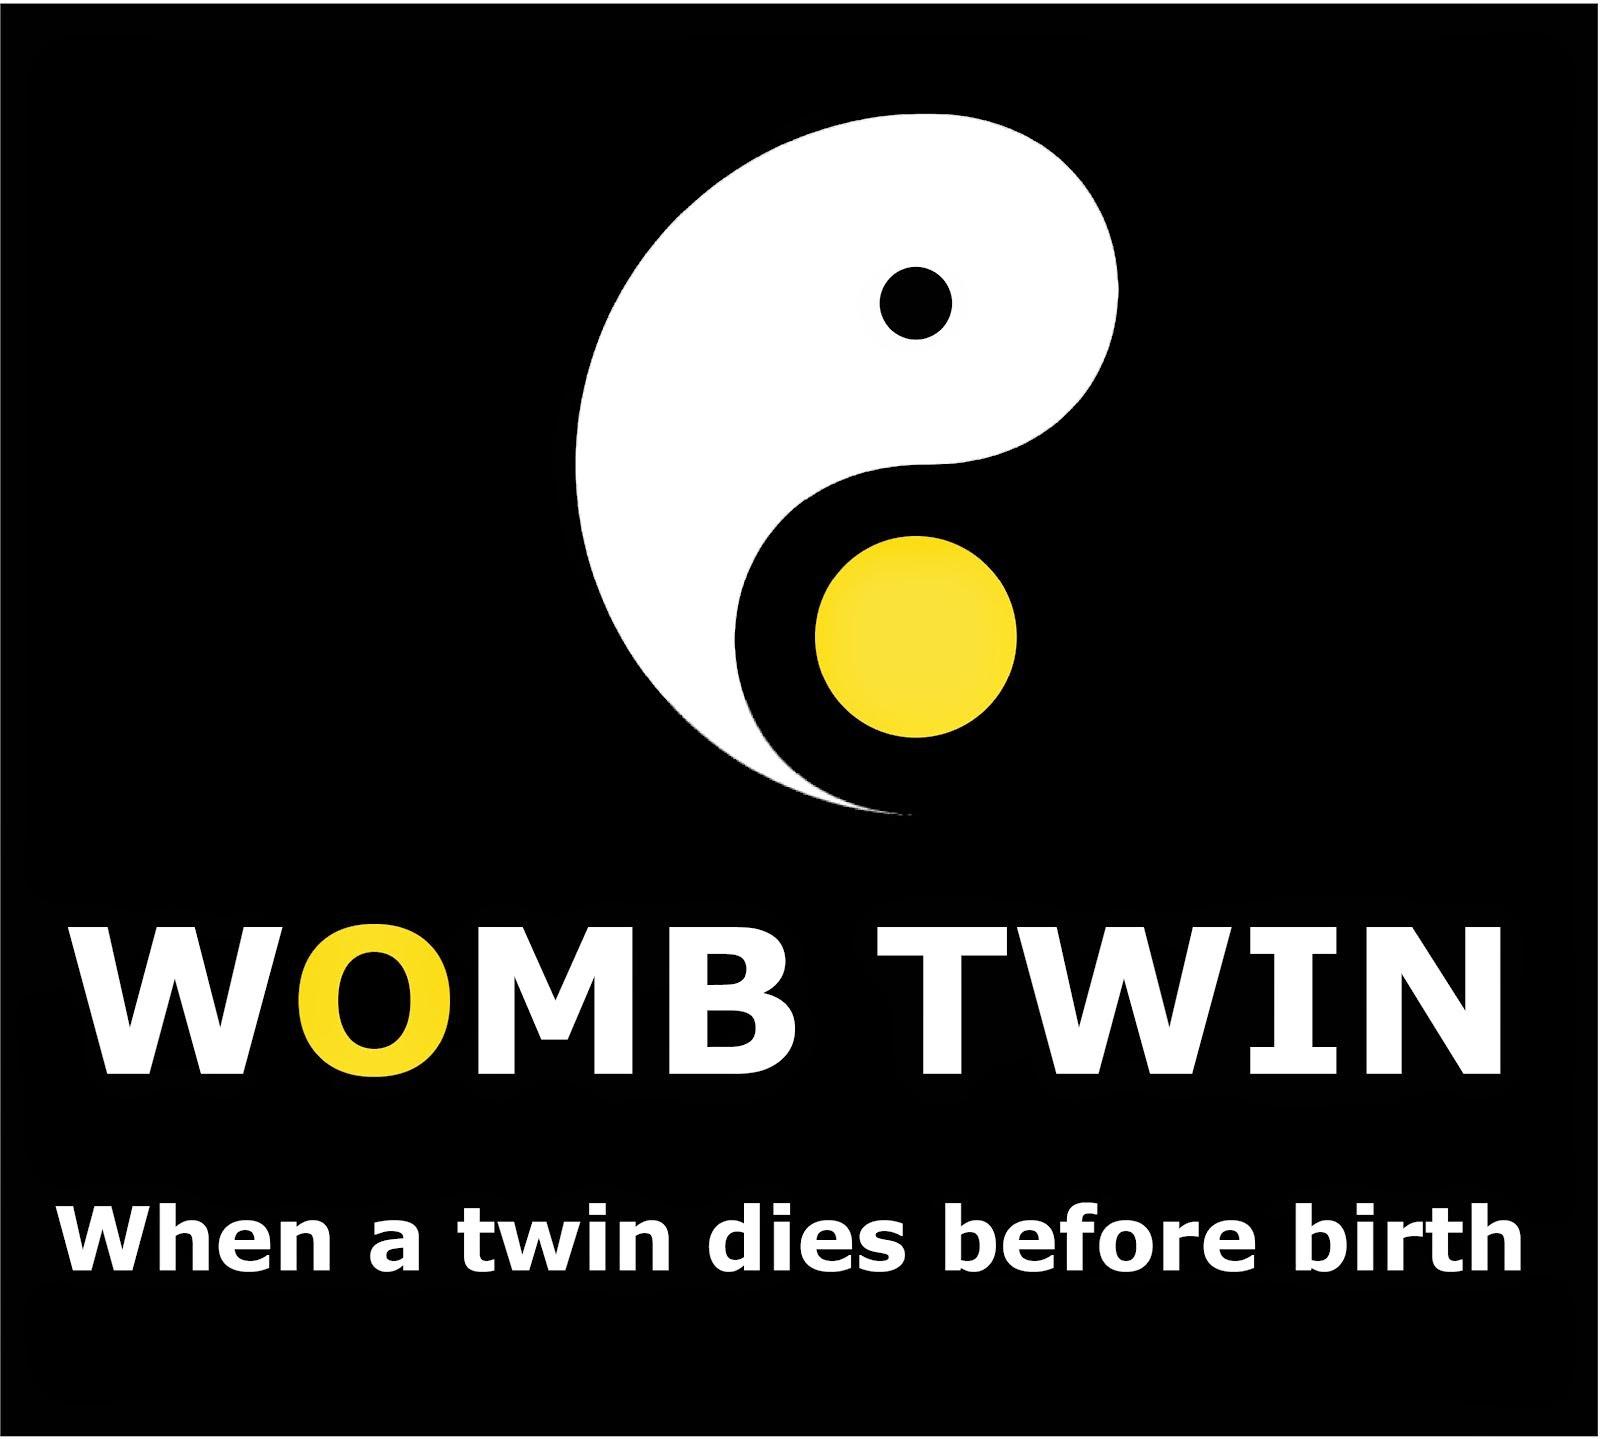 Womb Twin